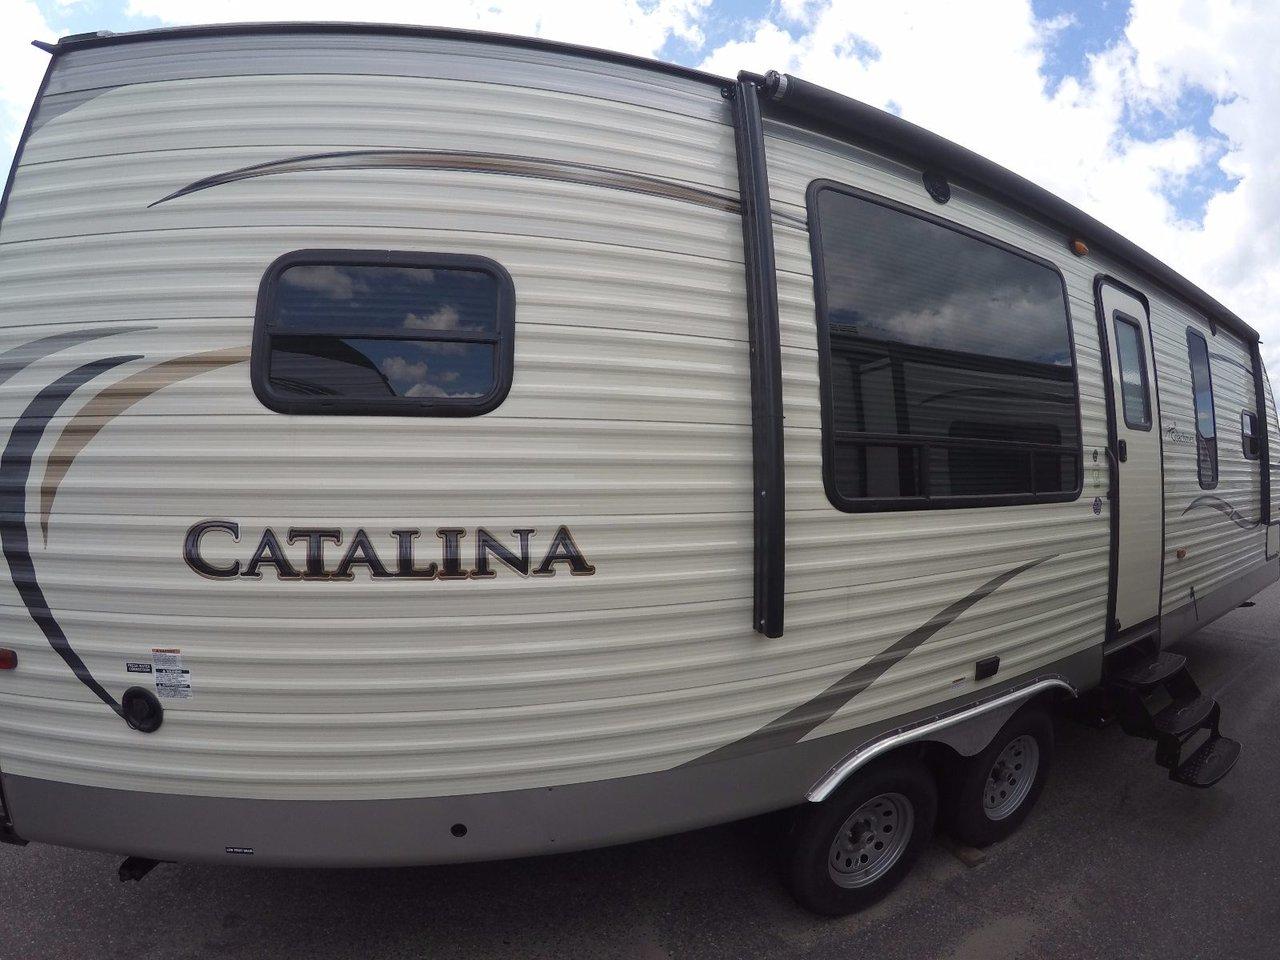 Coachmen Catalina For Sale Coachmen Catalina 293rks